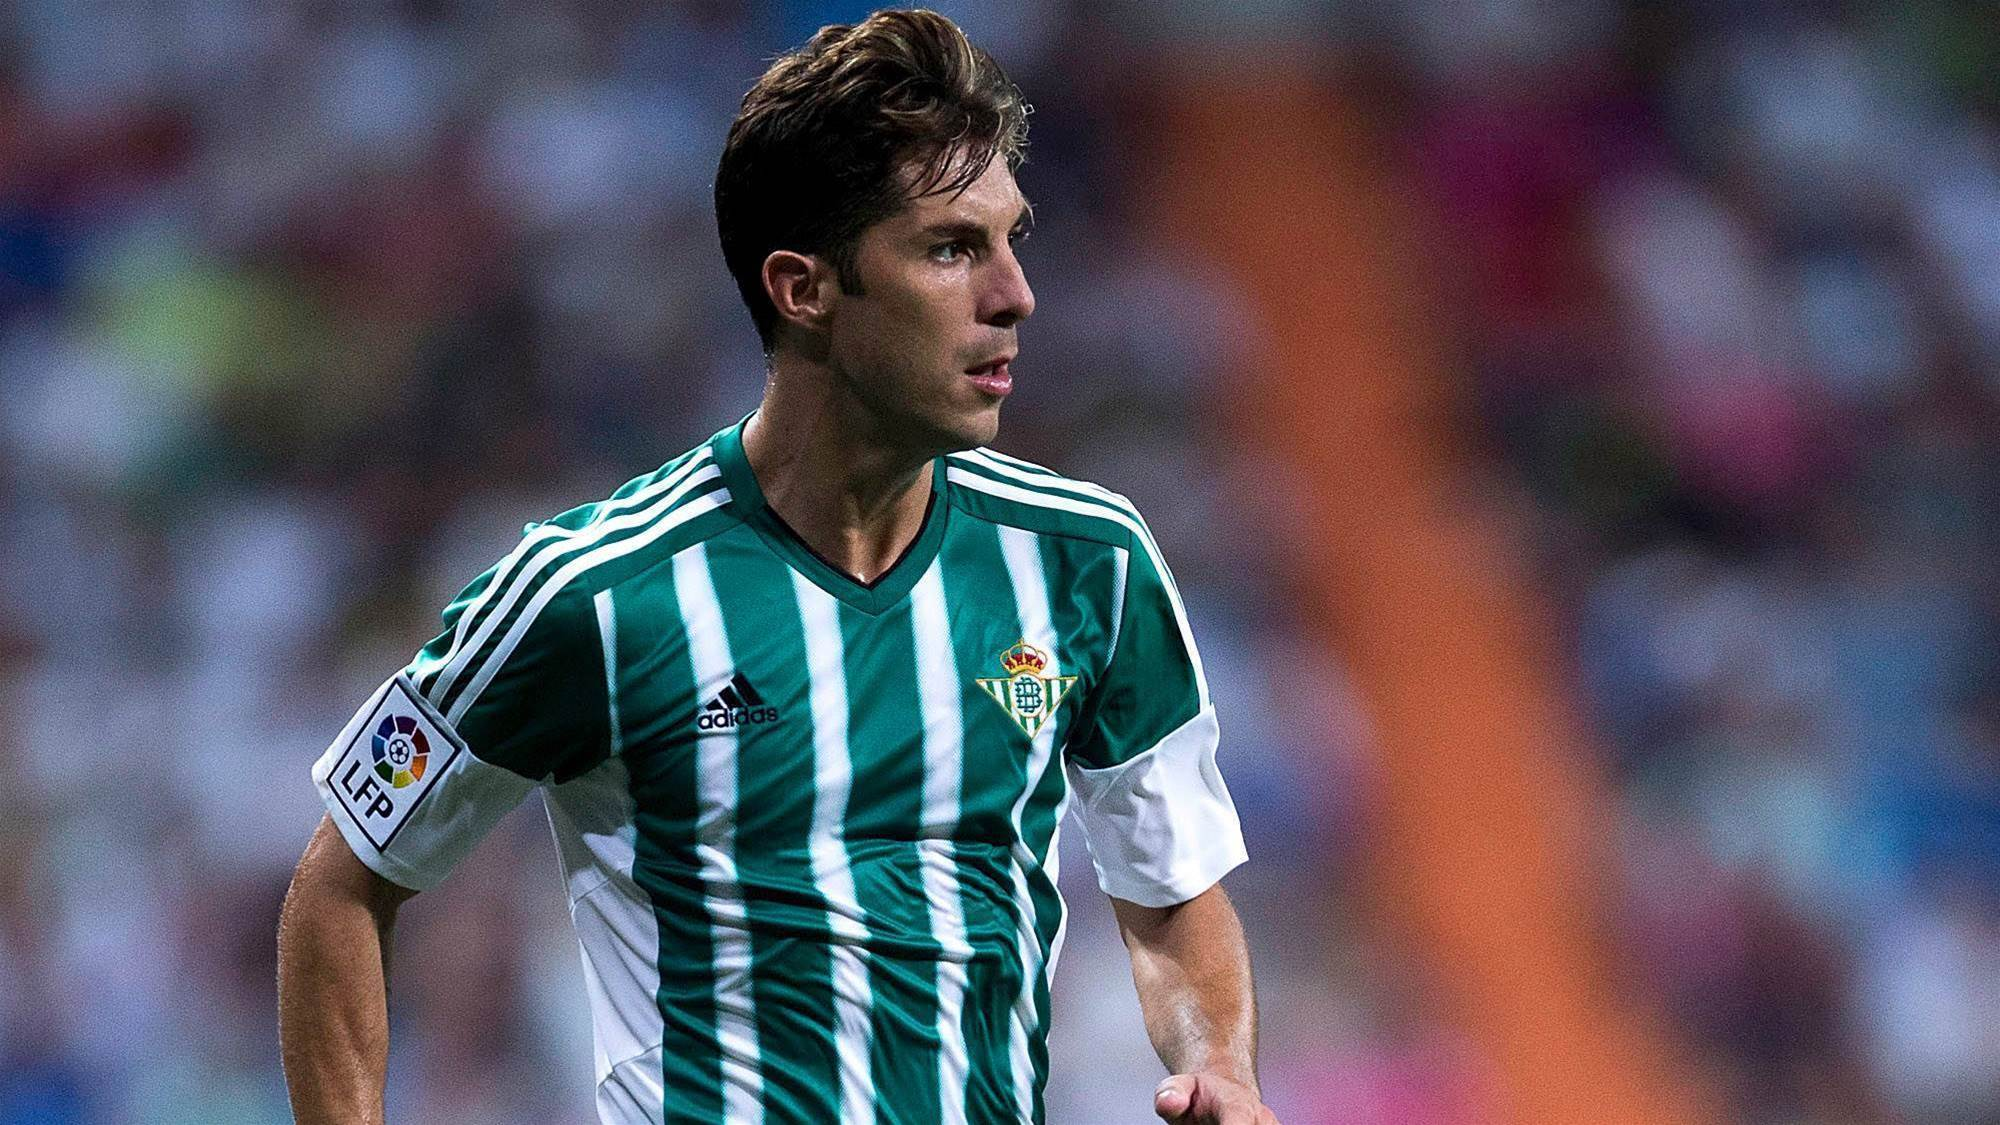 Wanderers sign Spanish winger Alvaro Cejudo